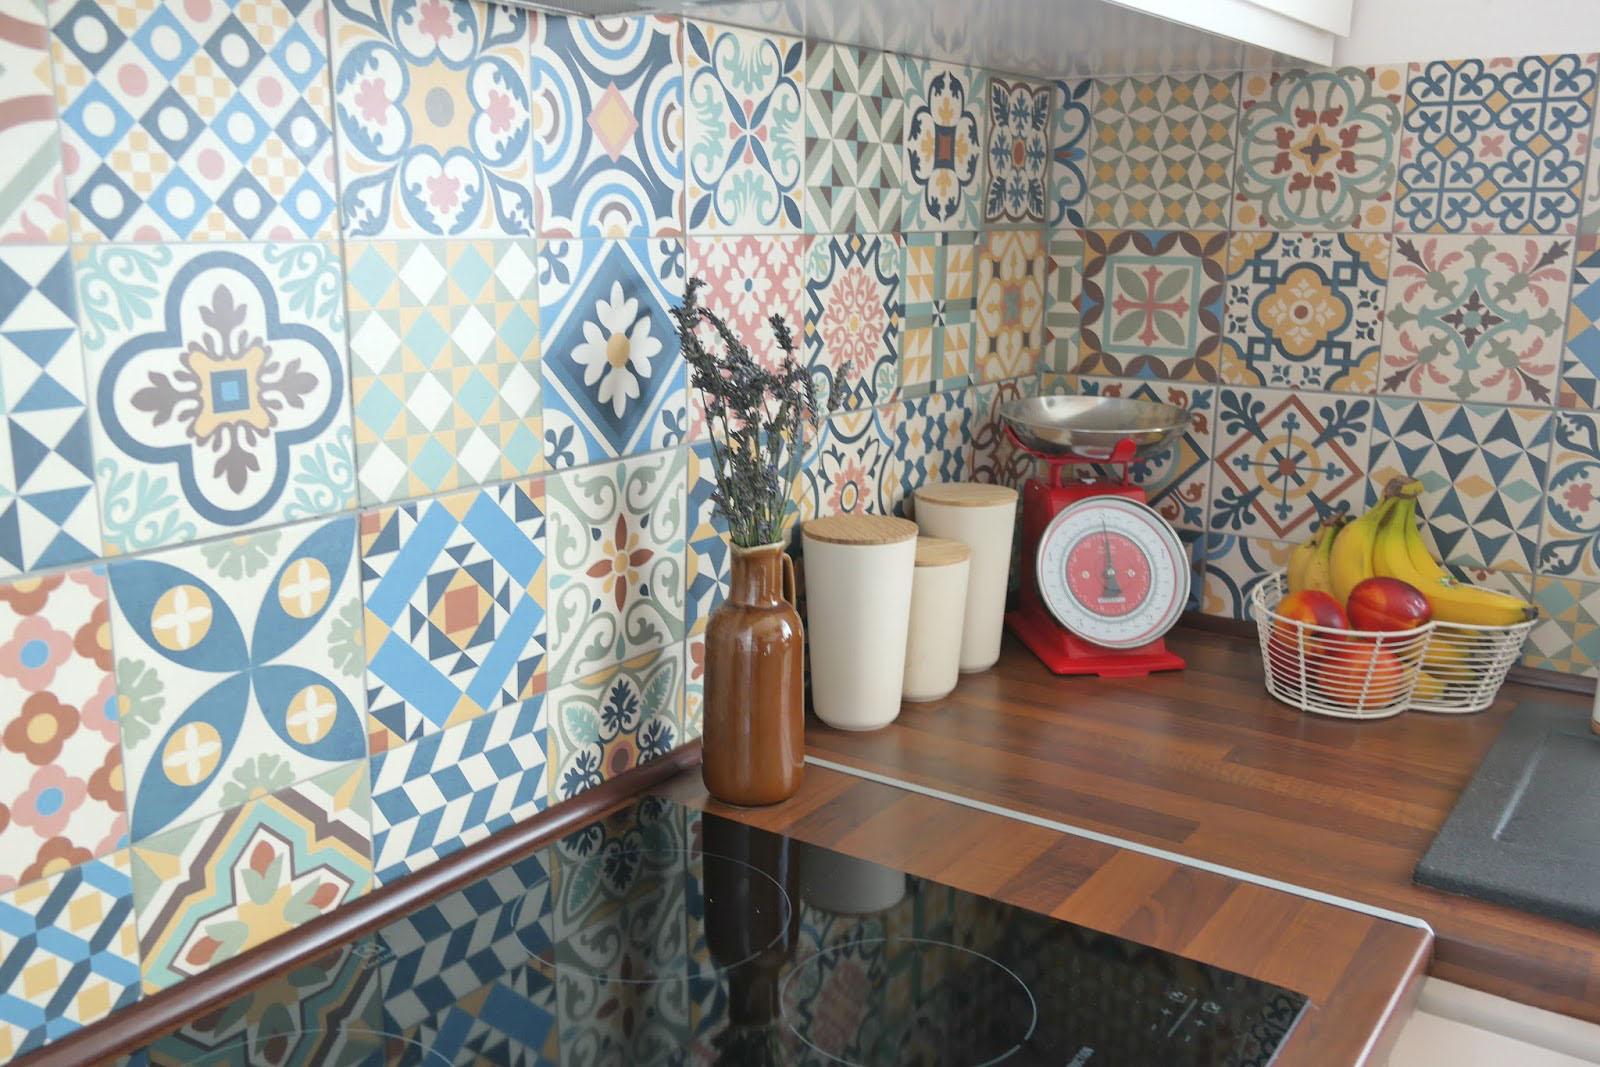 heritage-obklady-dlazba-dekory-mix-patchwork-mix-23